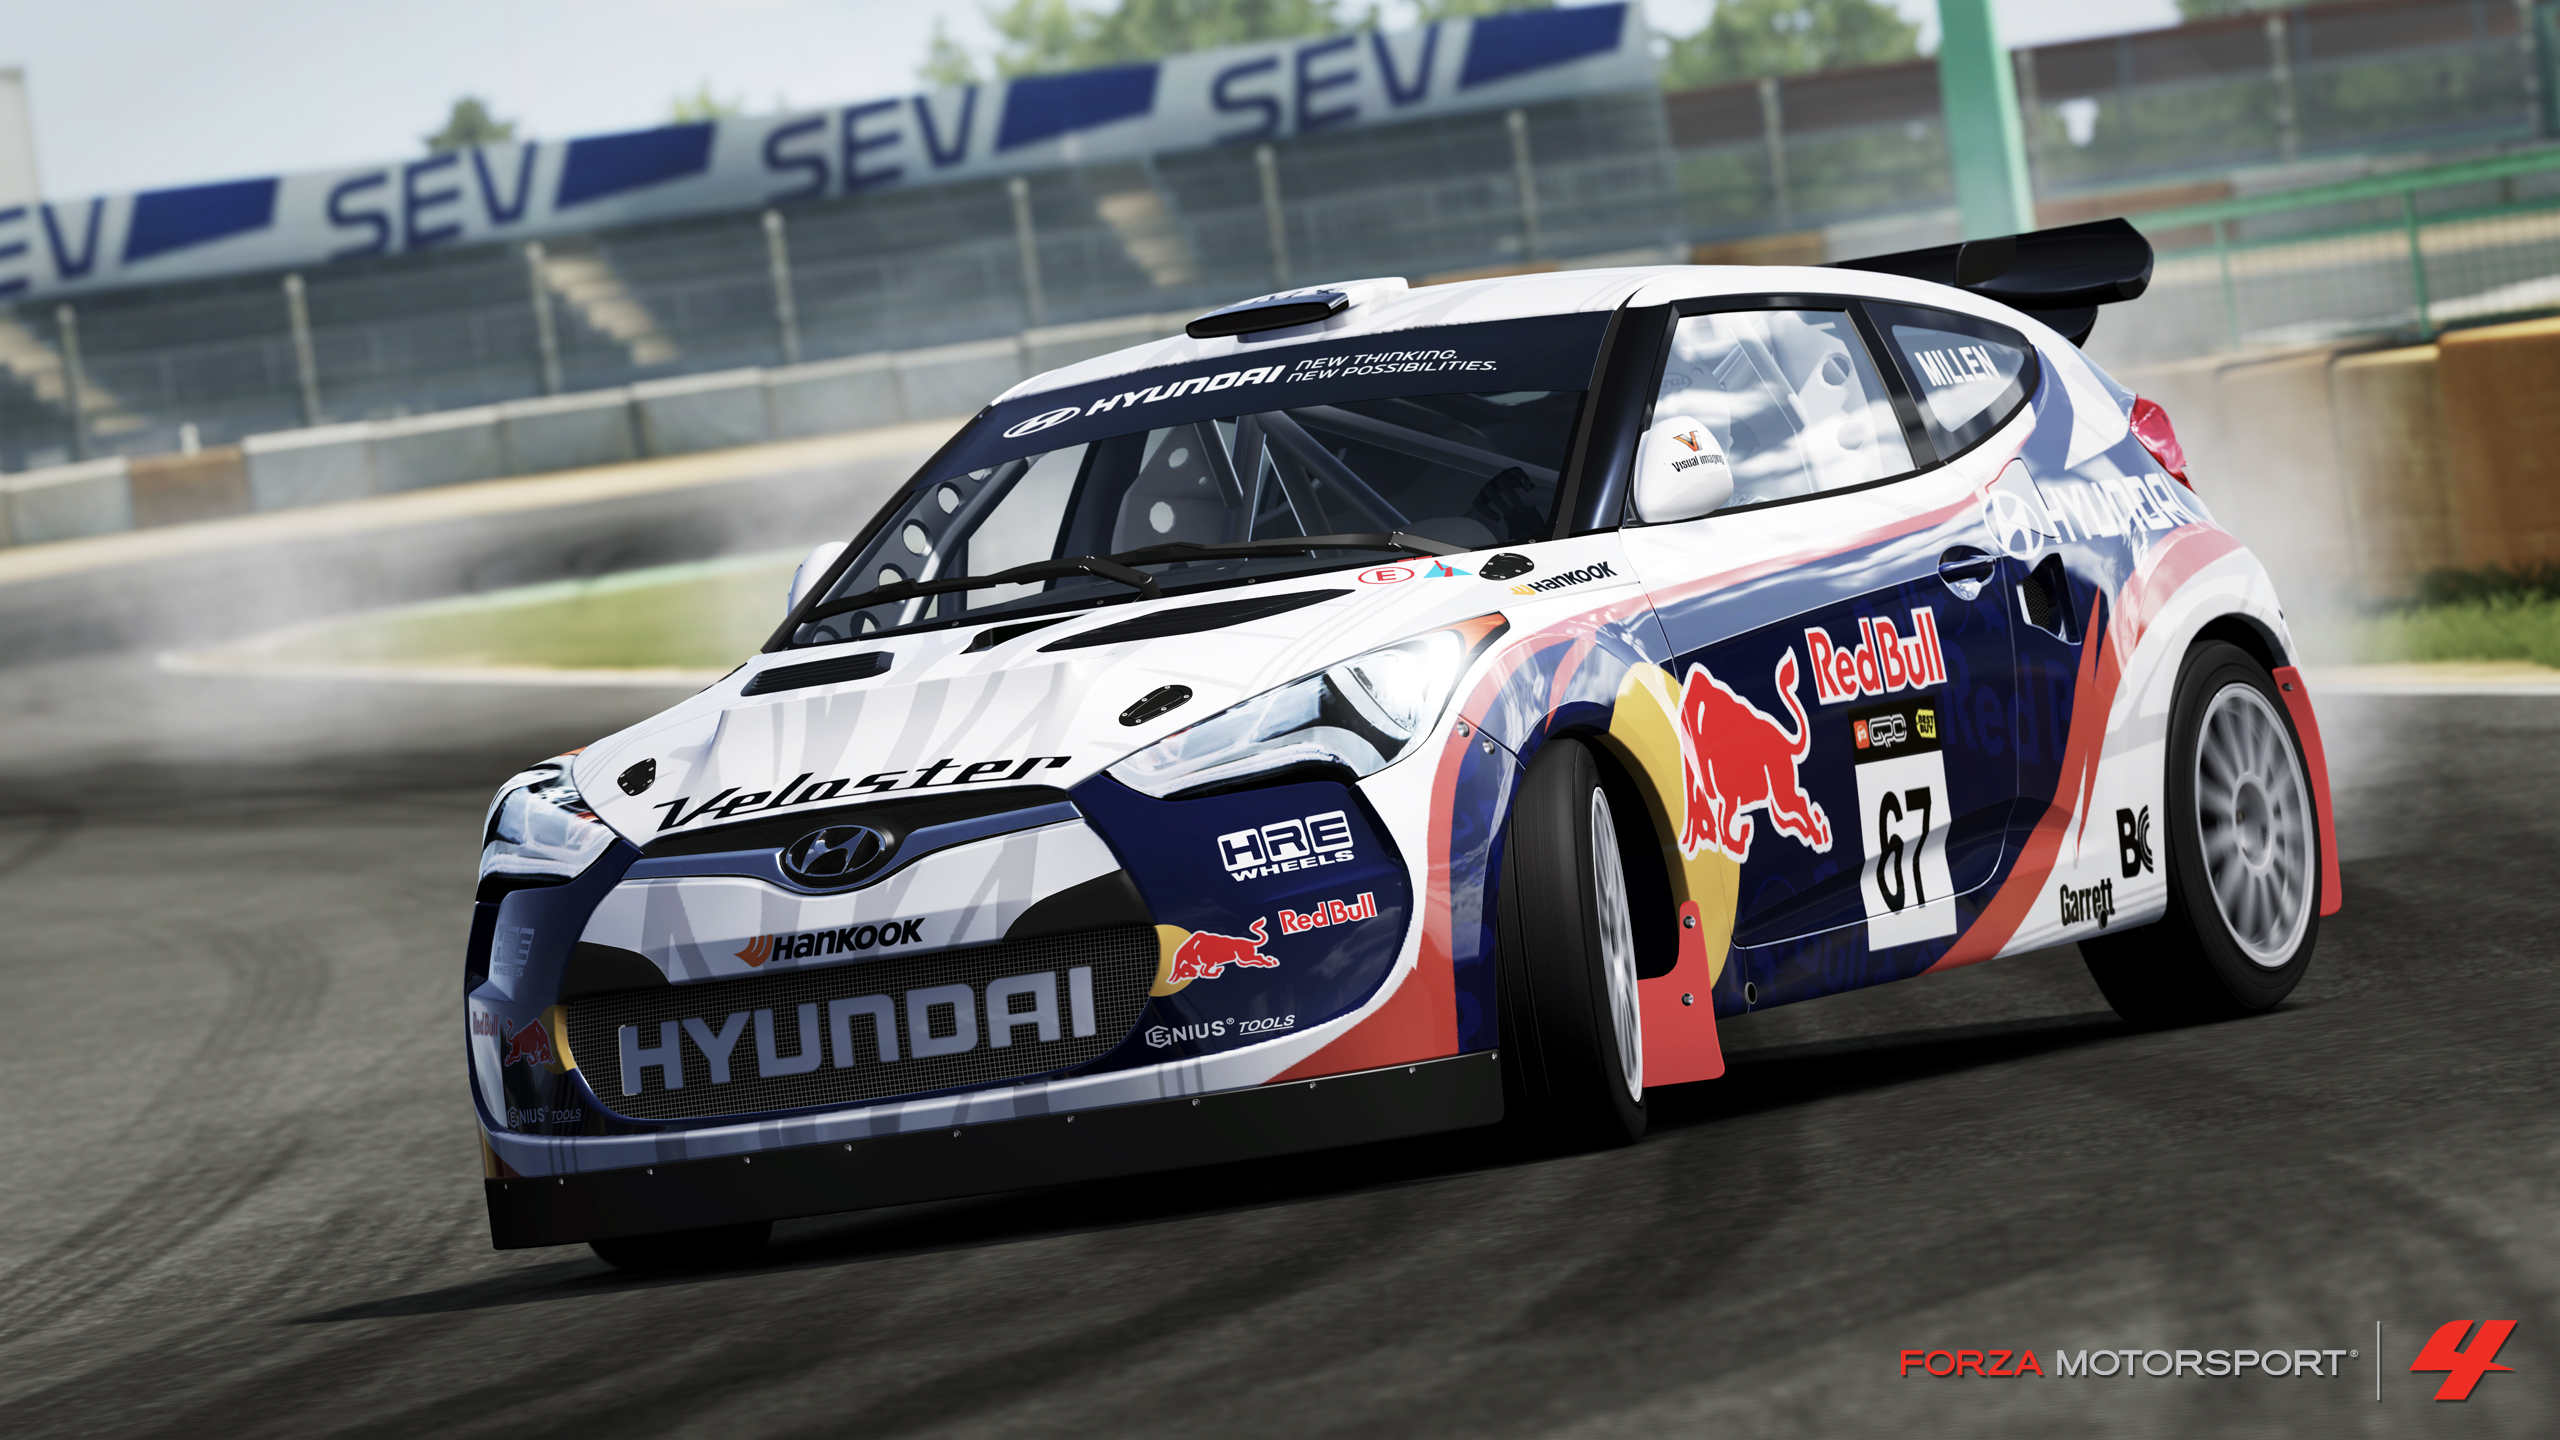 Hyundai 67 Rhys Millen Racing Veloster